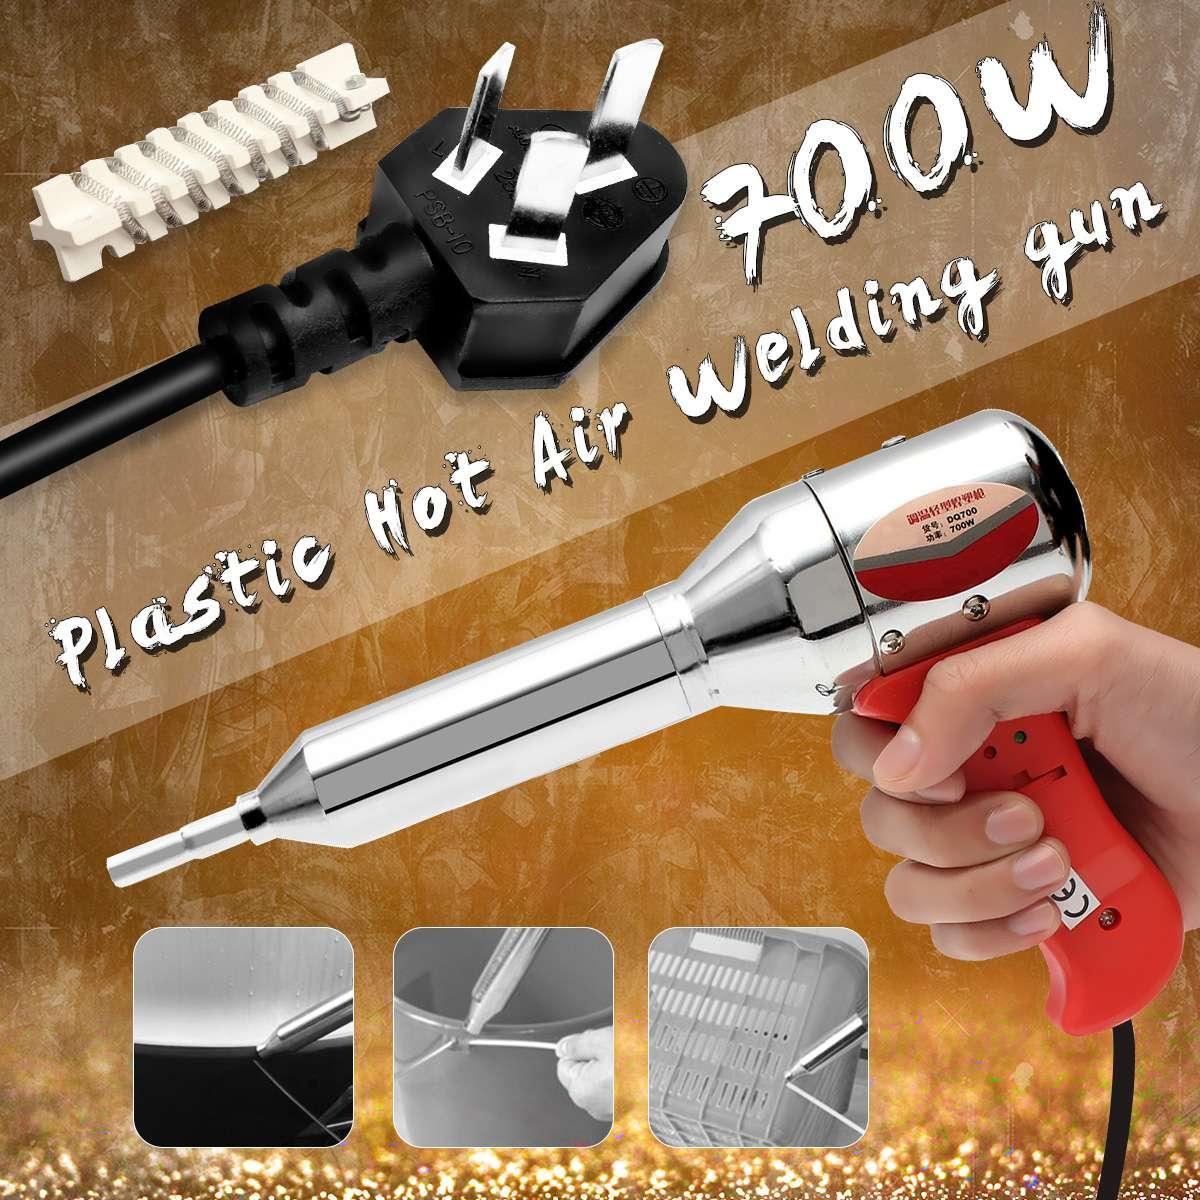 Hot Sale Portable 700W AC 220-240V Plastic Hot Air Welding Gun Temperature Heat 100-450 Degree With Ceramic Heater